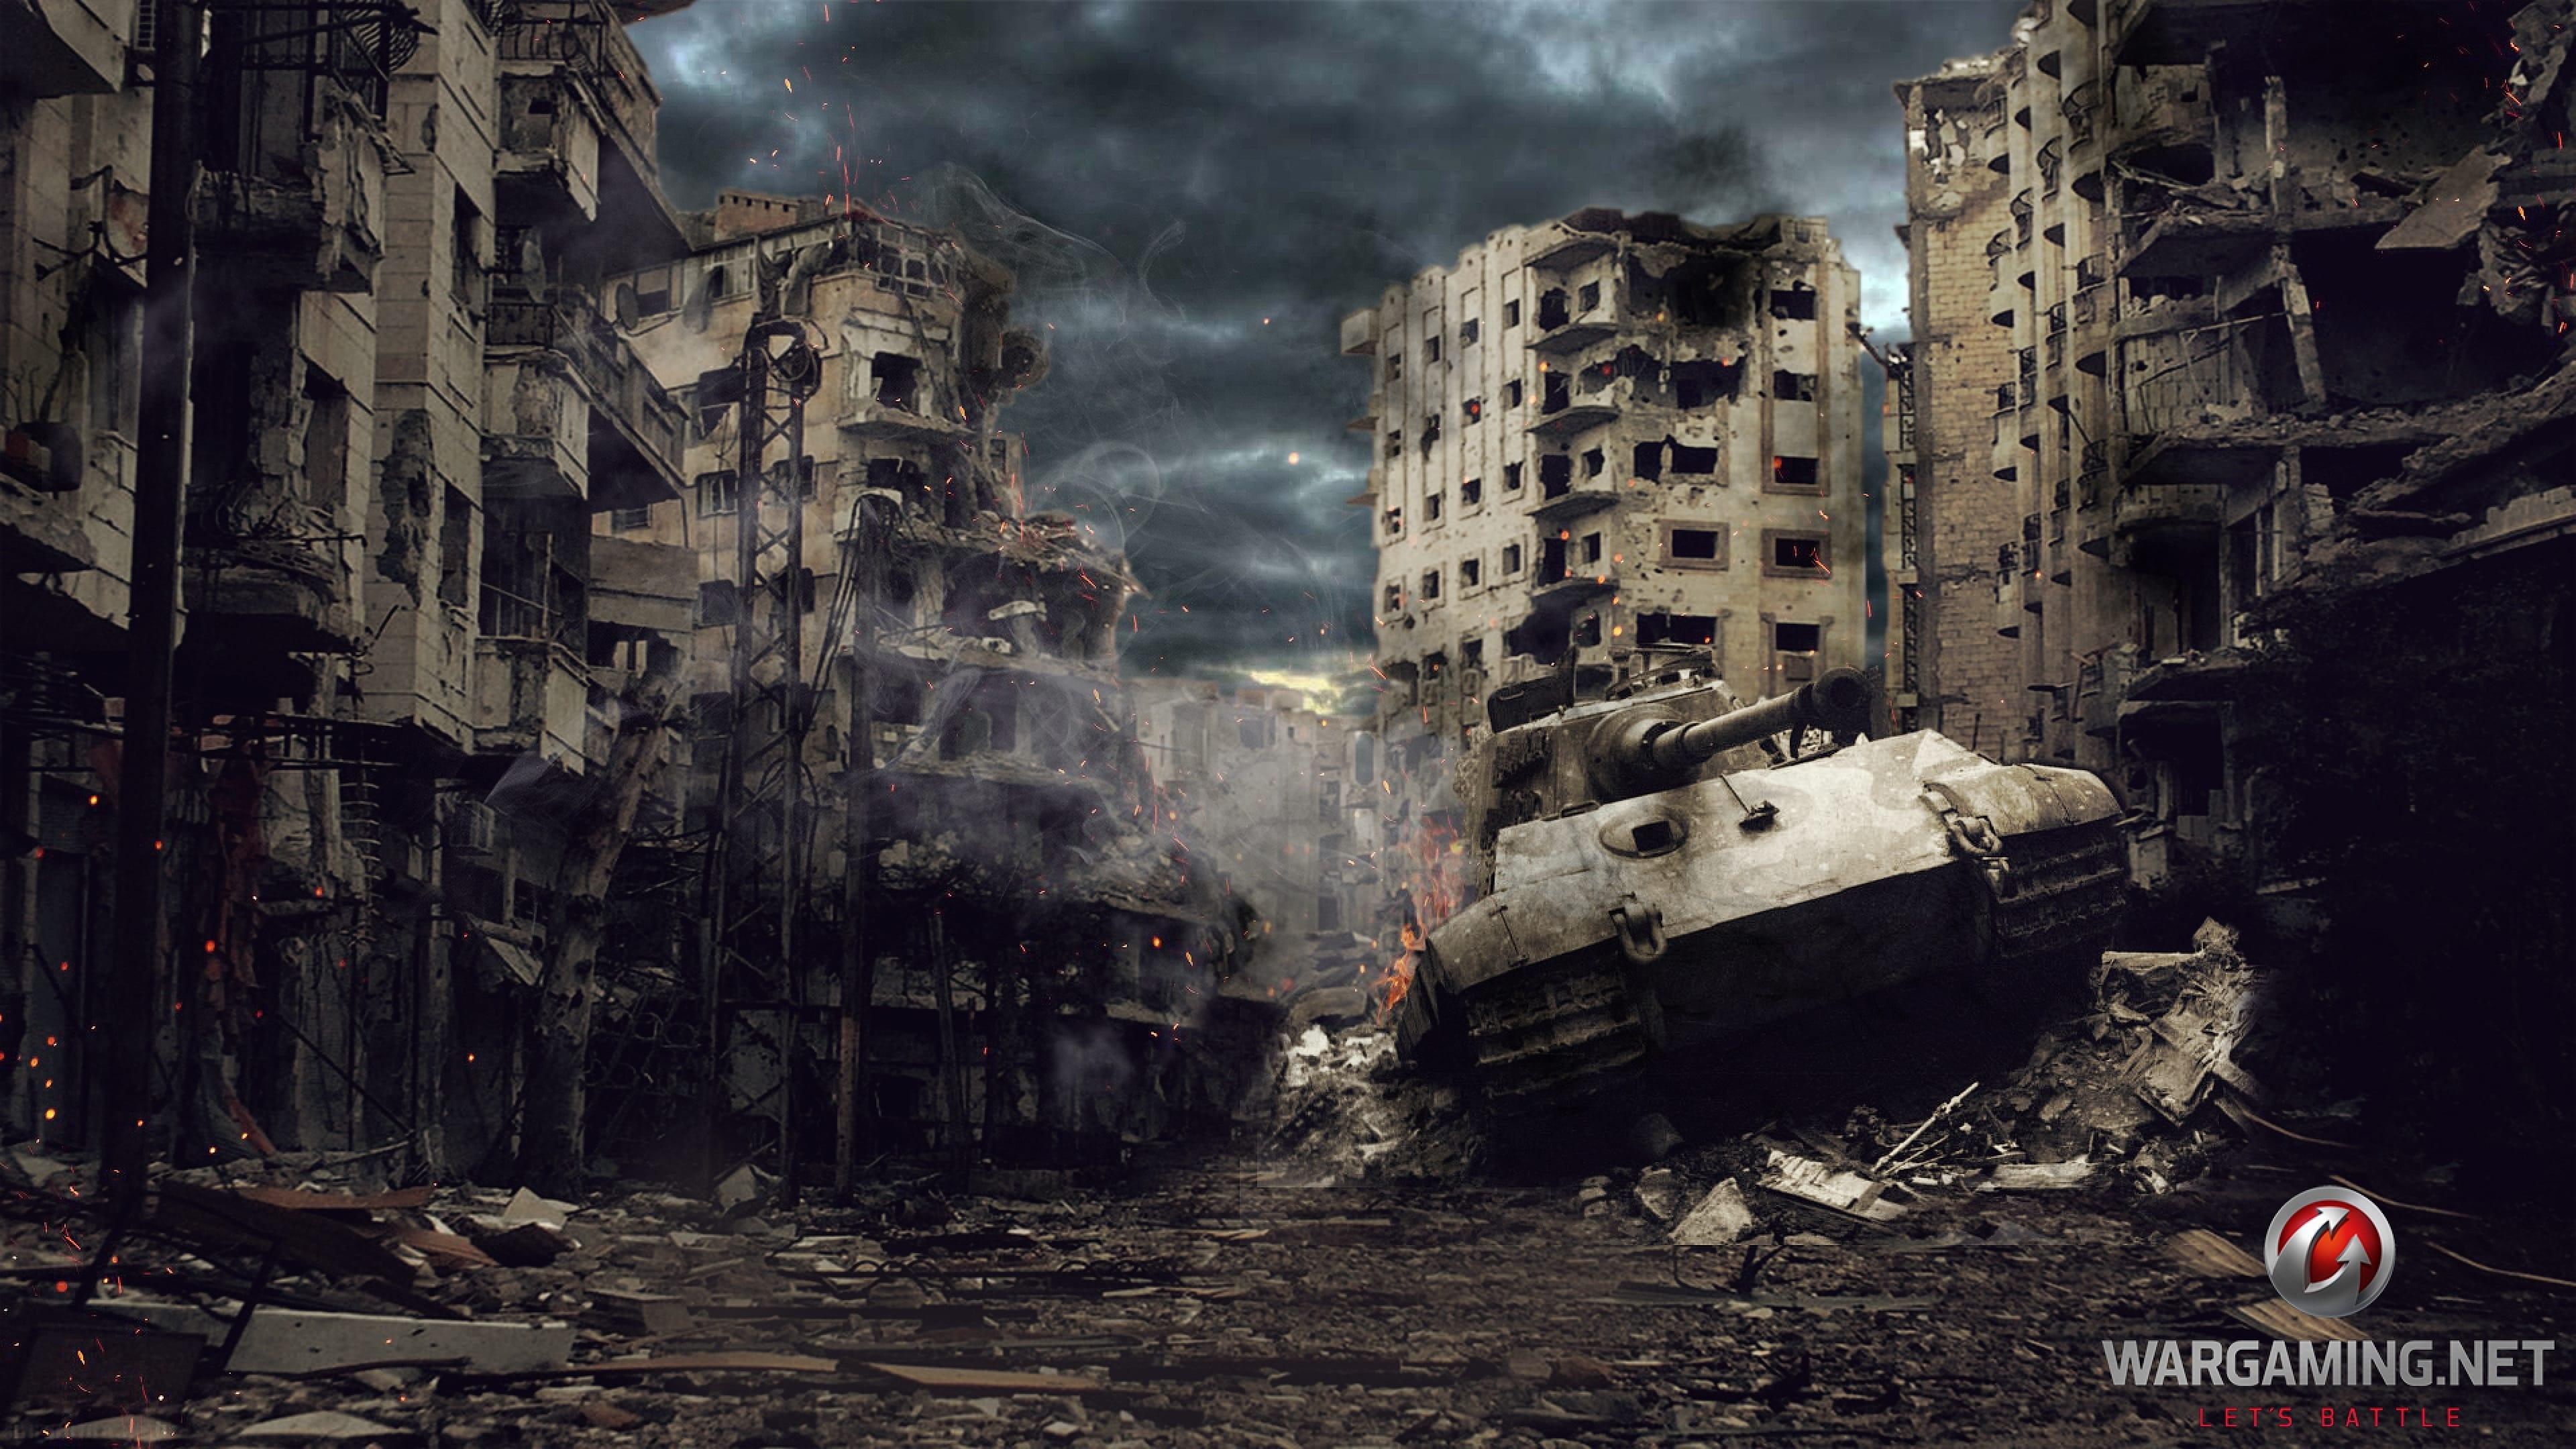 War PC Wallpaper HD